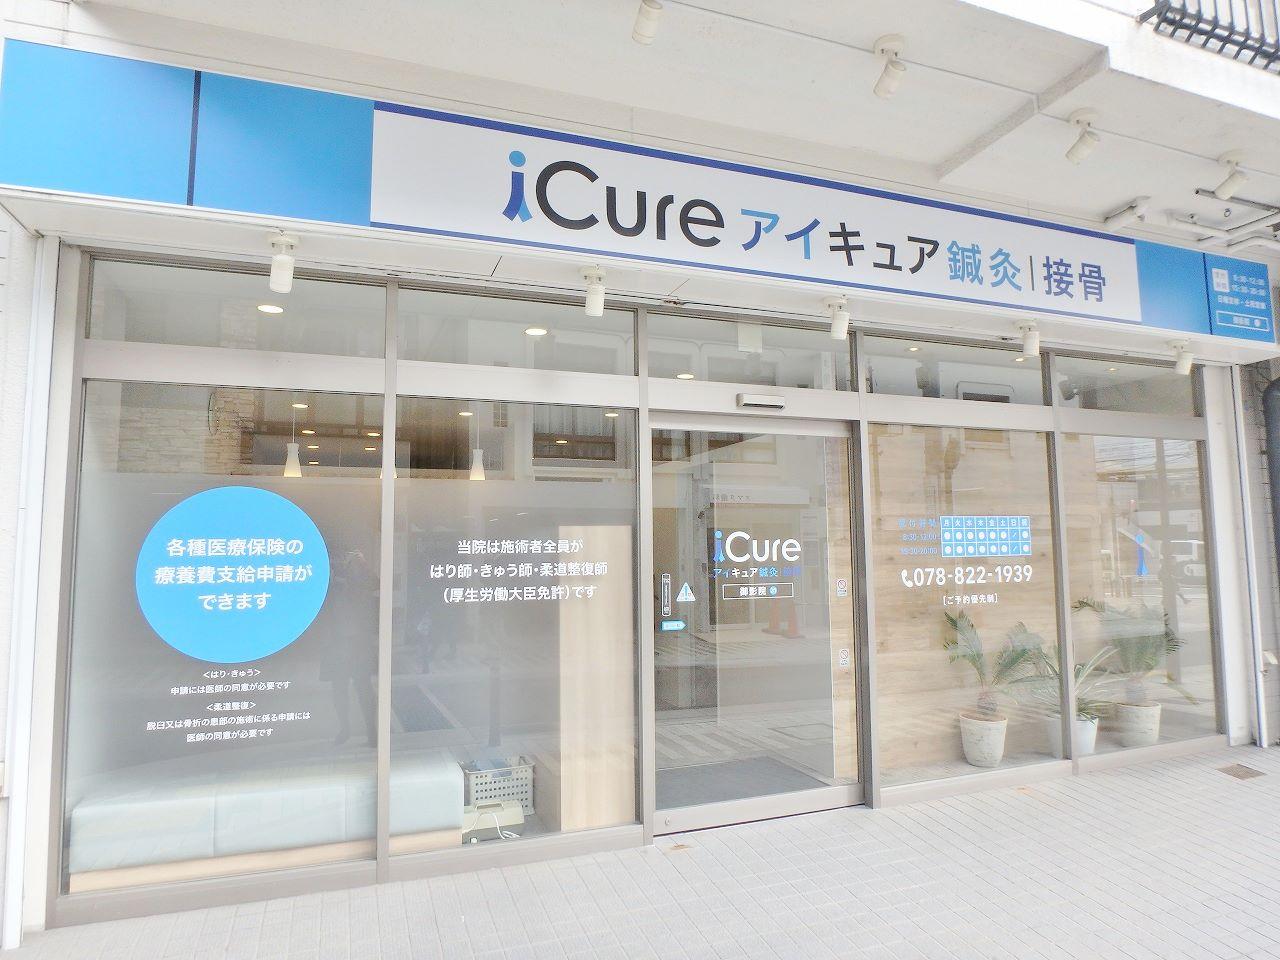 iCure鍼灸接骨院は全員が 国家資格を持った施術者です